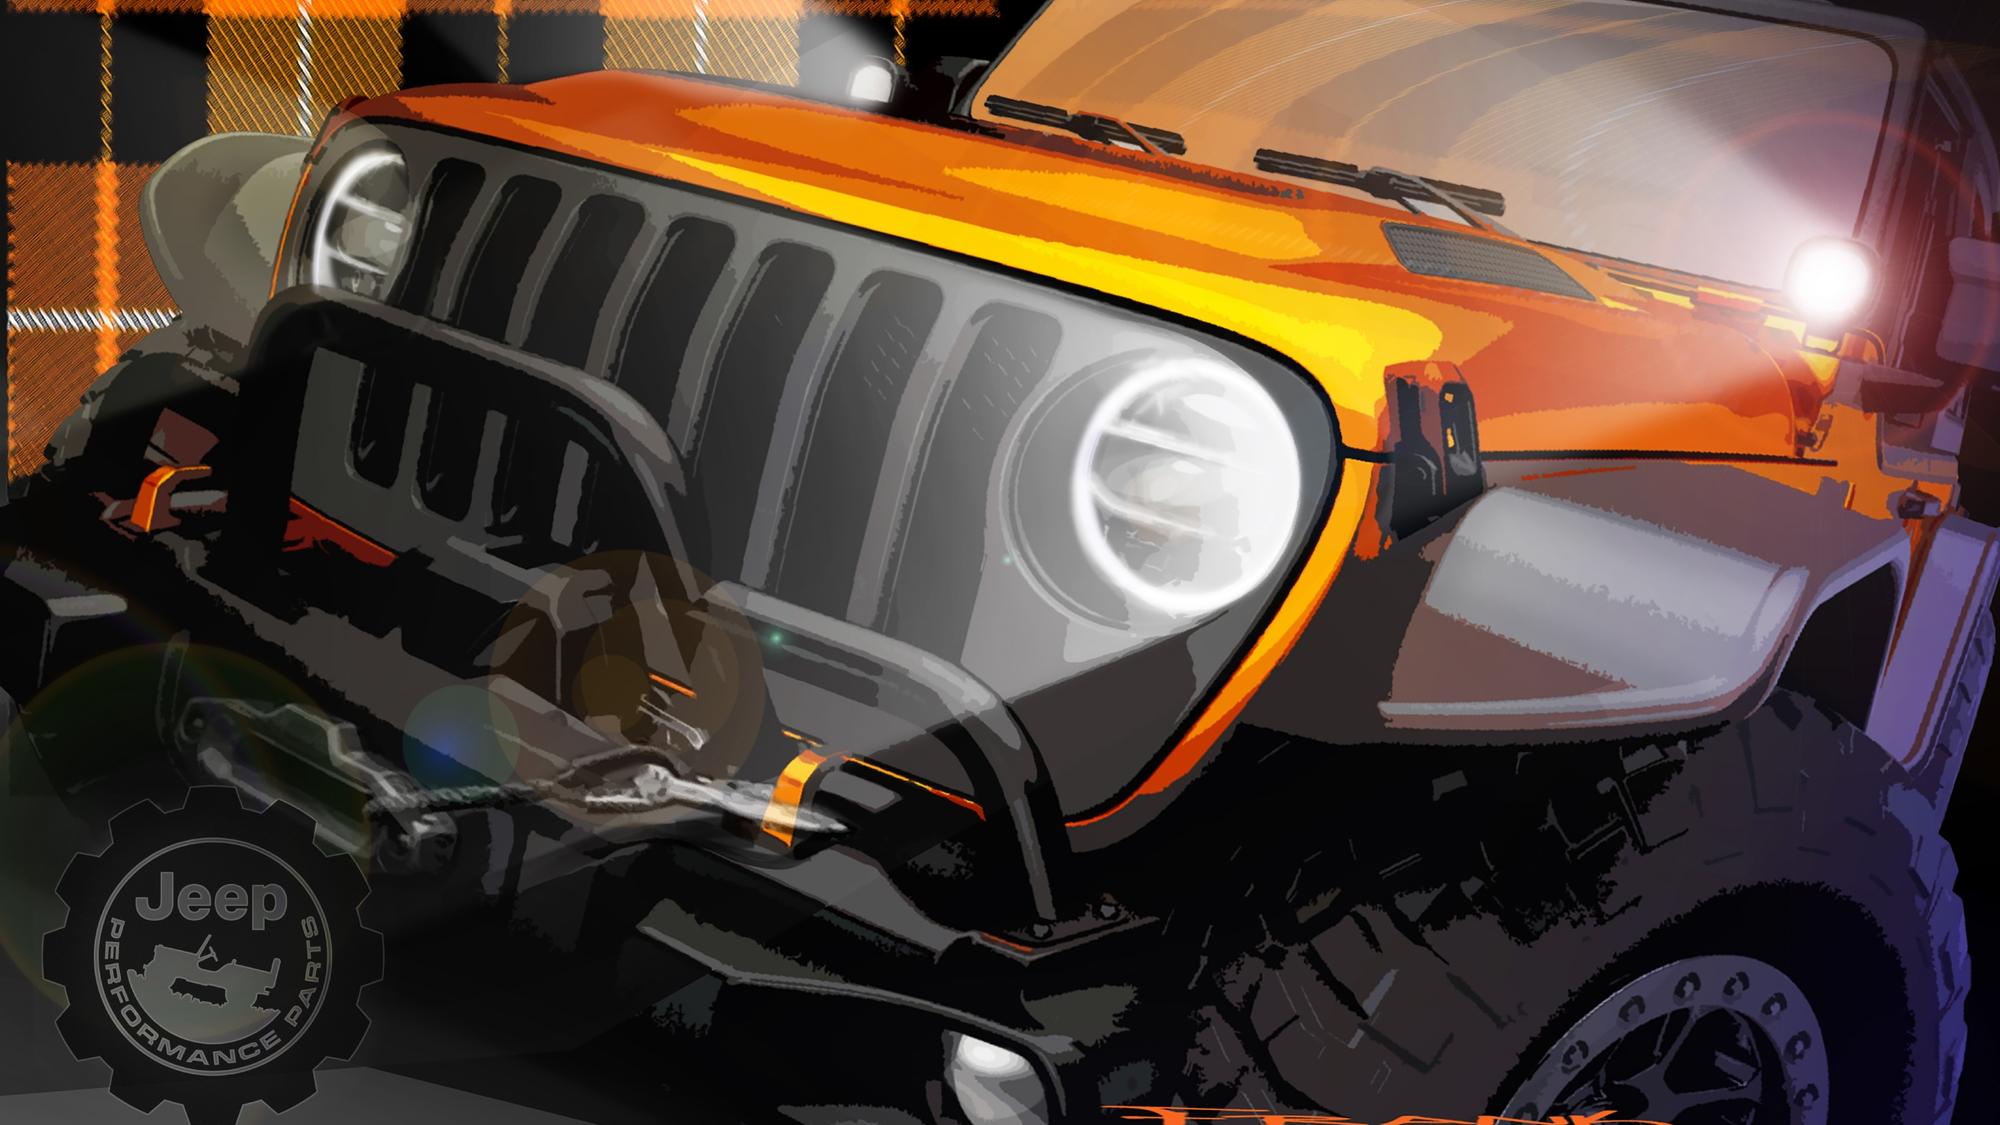 Teaser for Jeep Wrangler concept debuting at 2021 Moab Easter Safari